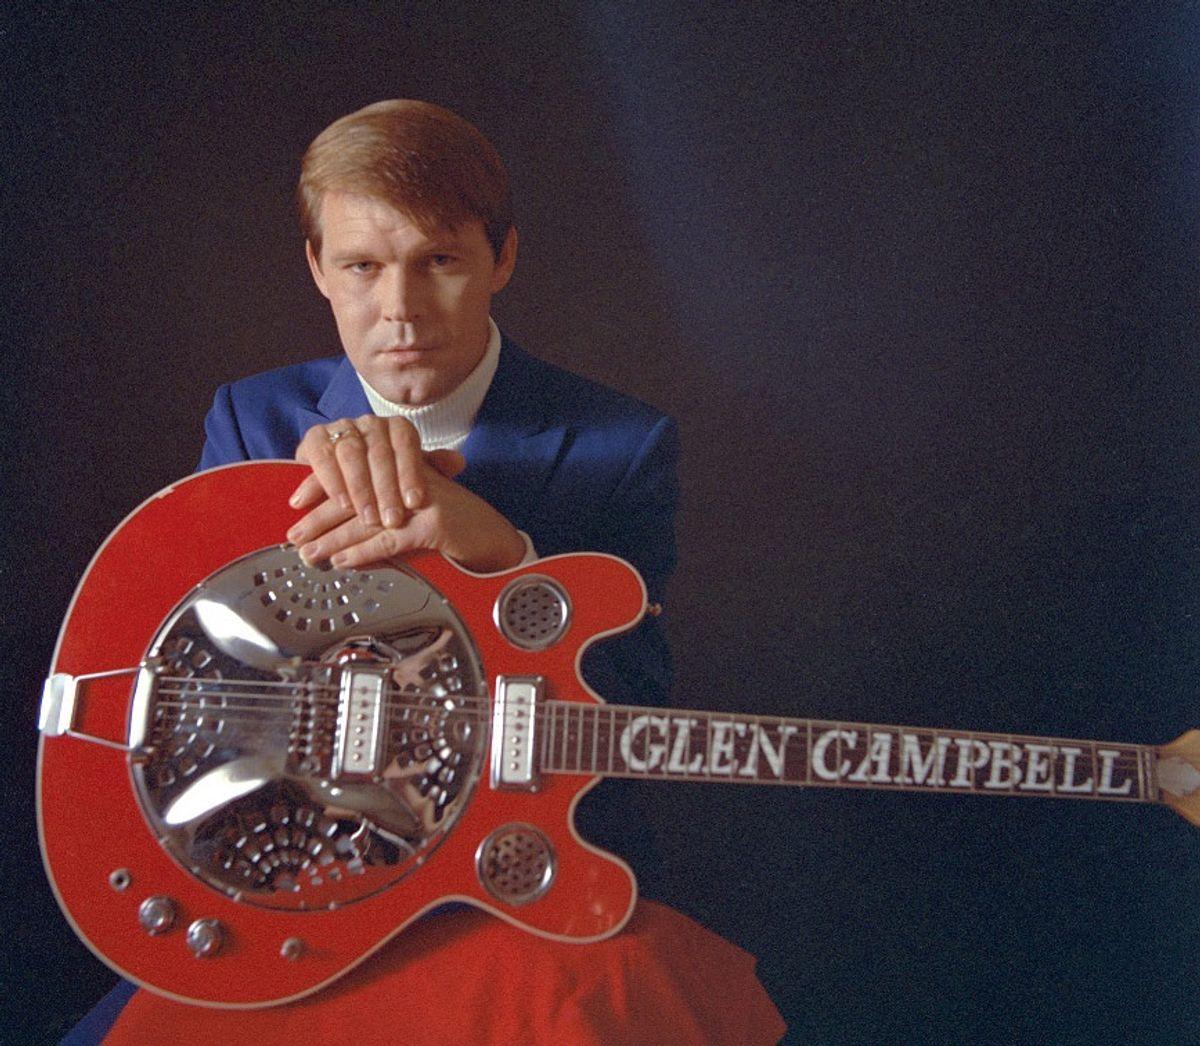 Glen Campbell: 1936–2017